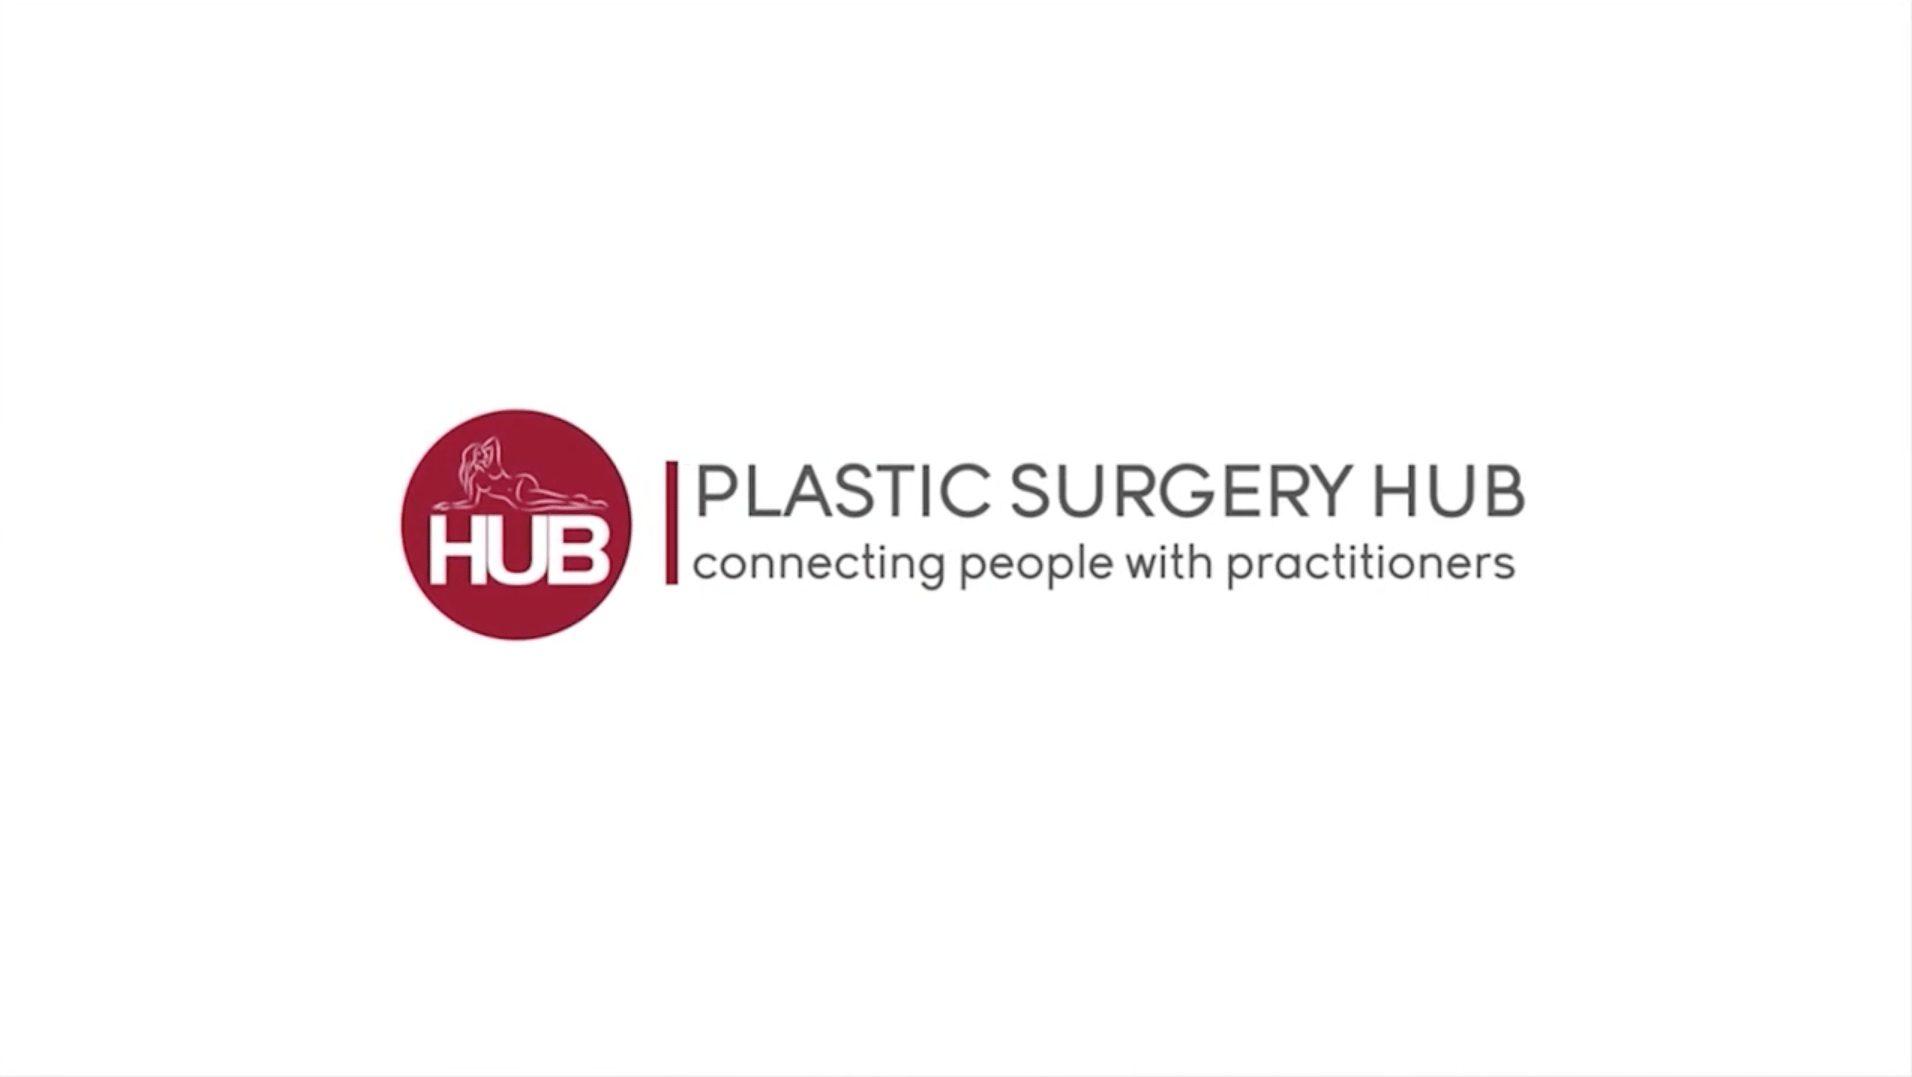 Plastic Surgery Hub Cryoliplysis